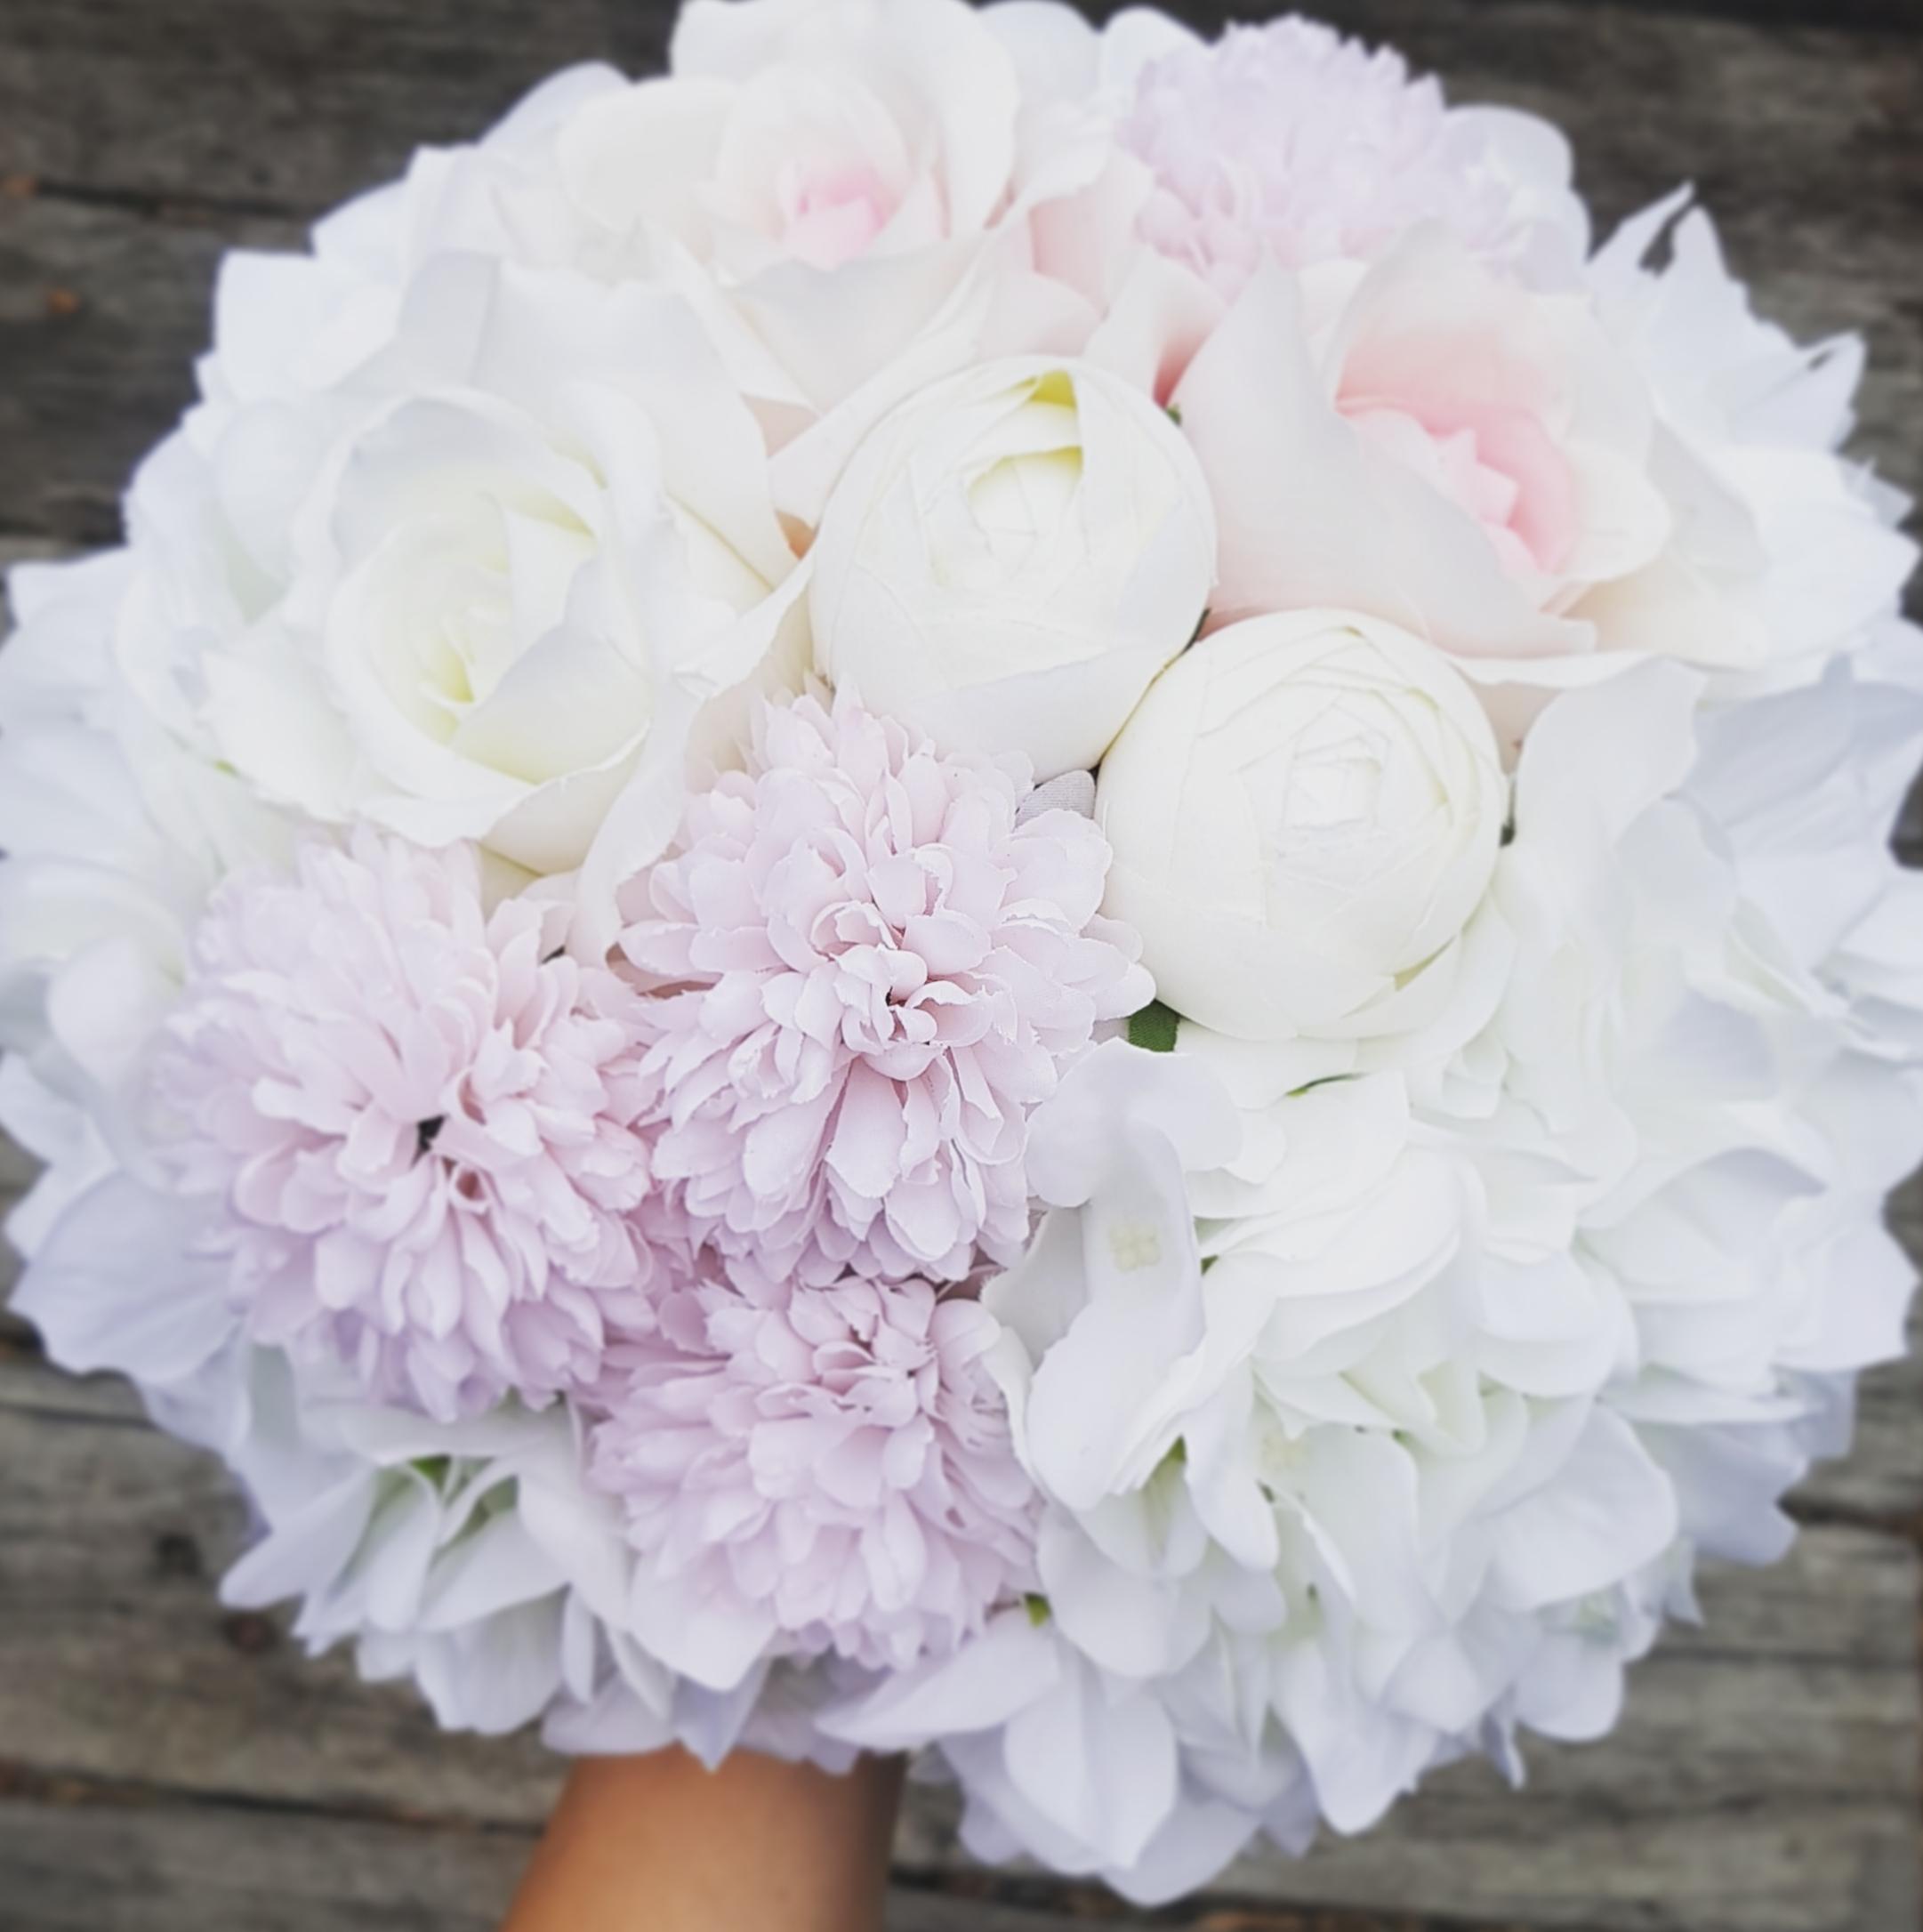 Hydrangeas & Chrysanthemums